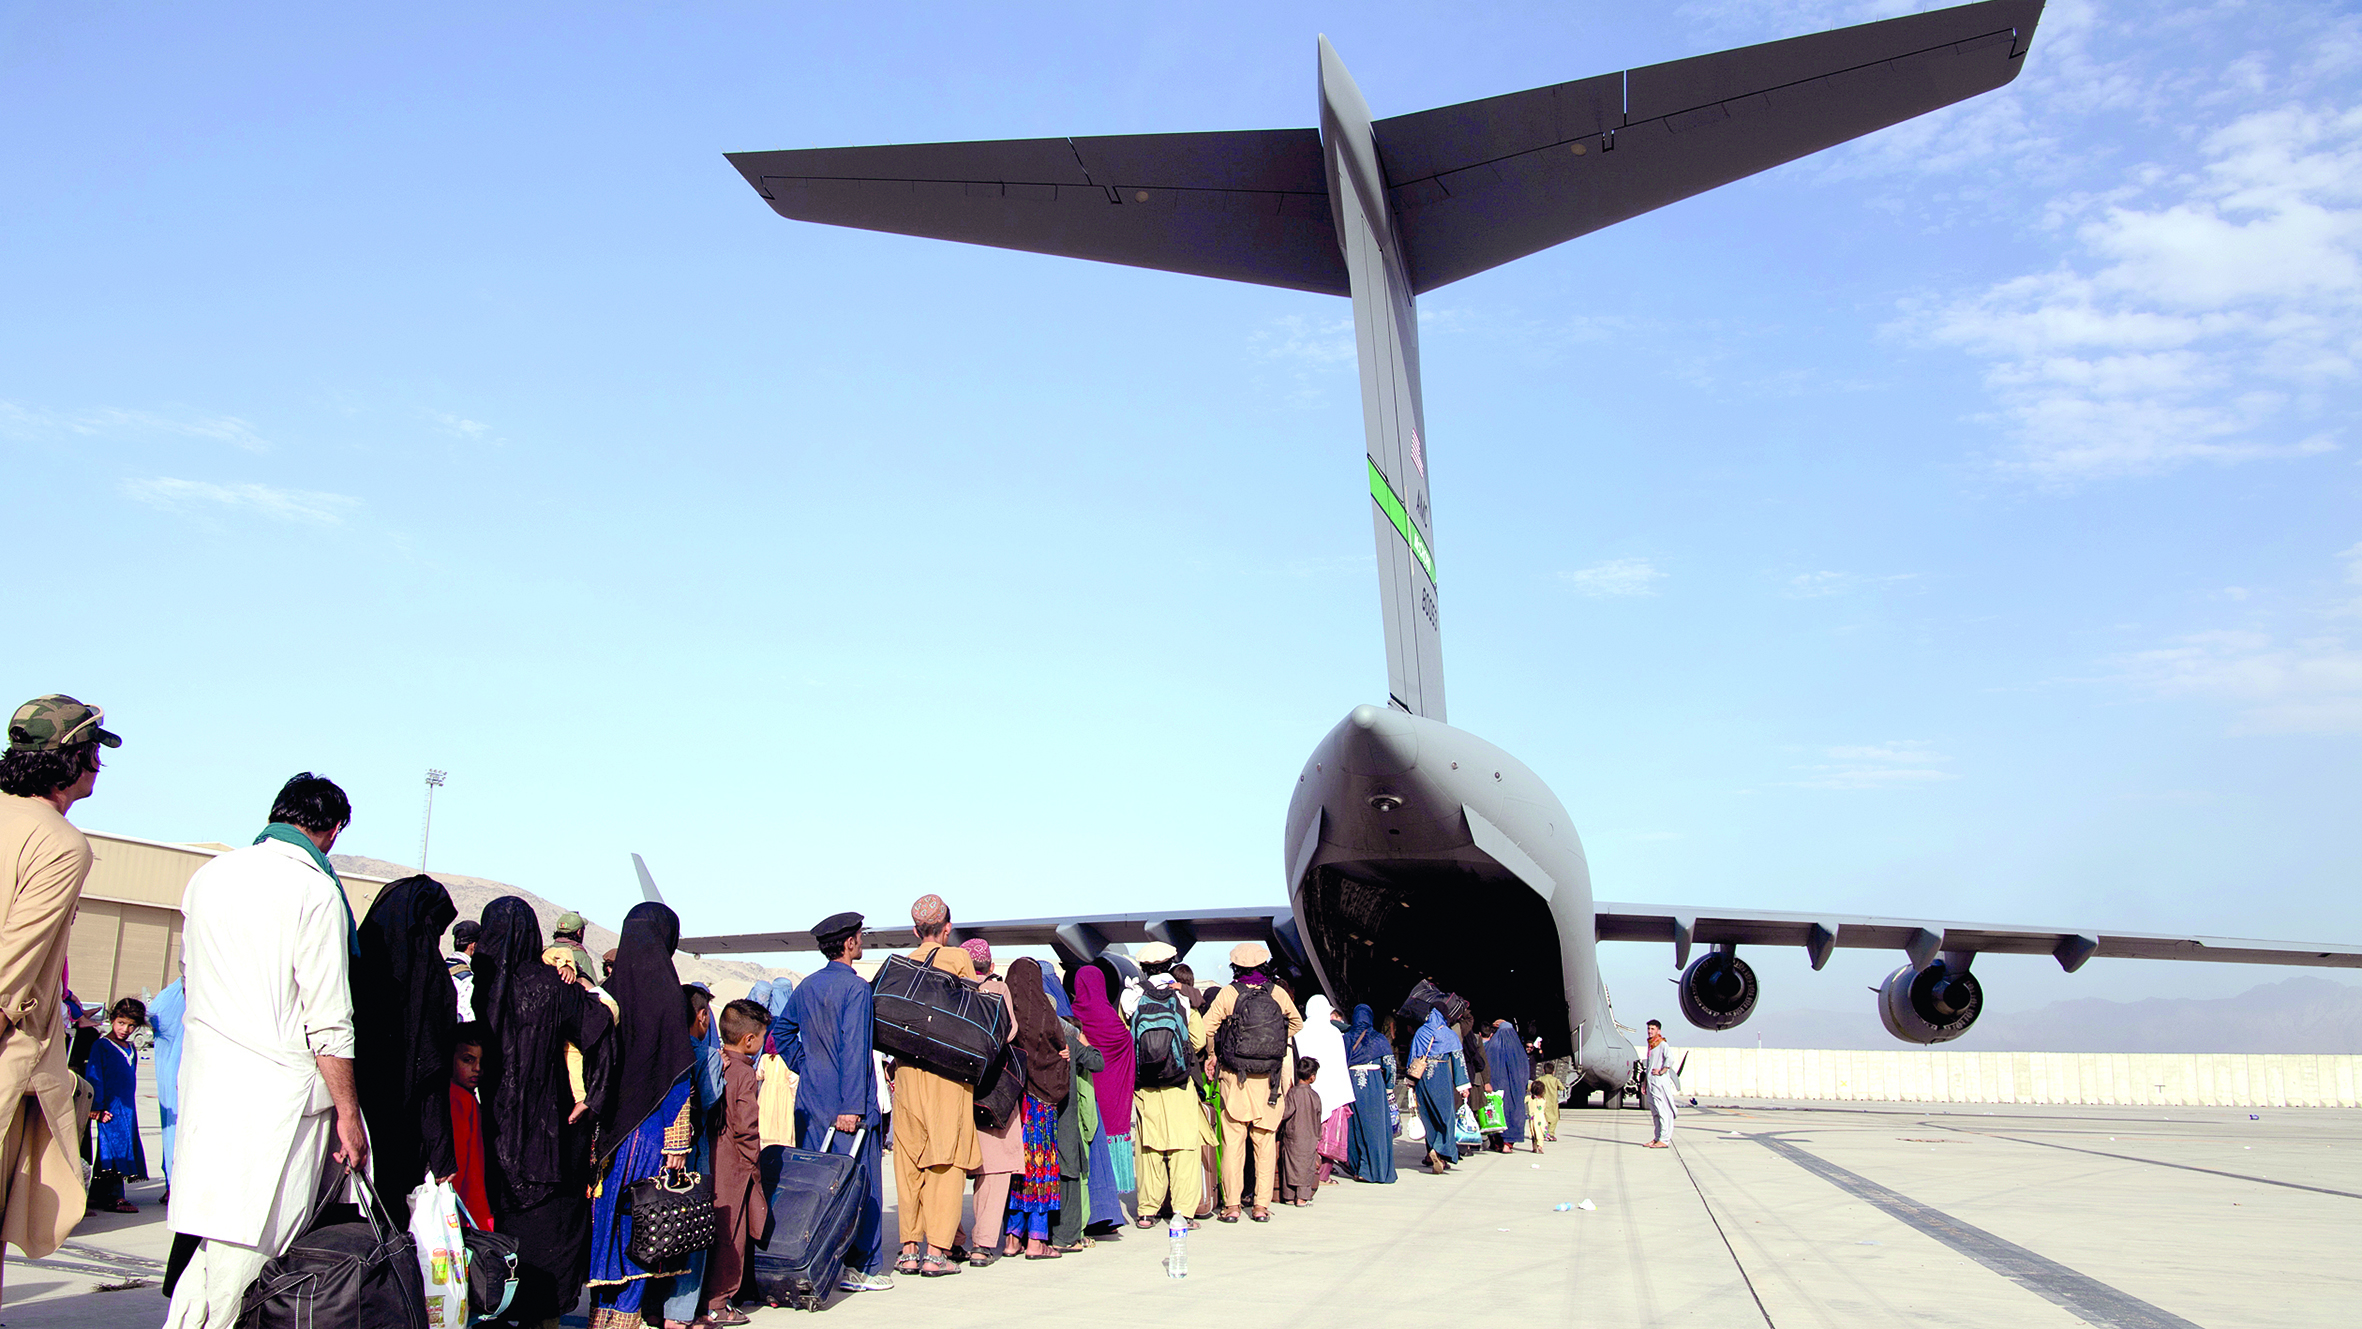 Taliban to Al Jazeera: We will ask Qatar to help run Kabul airport